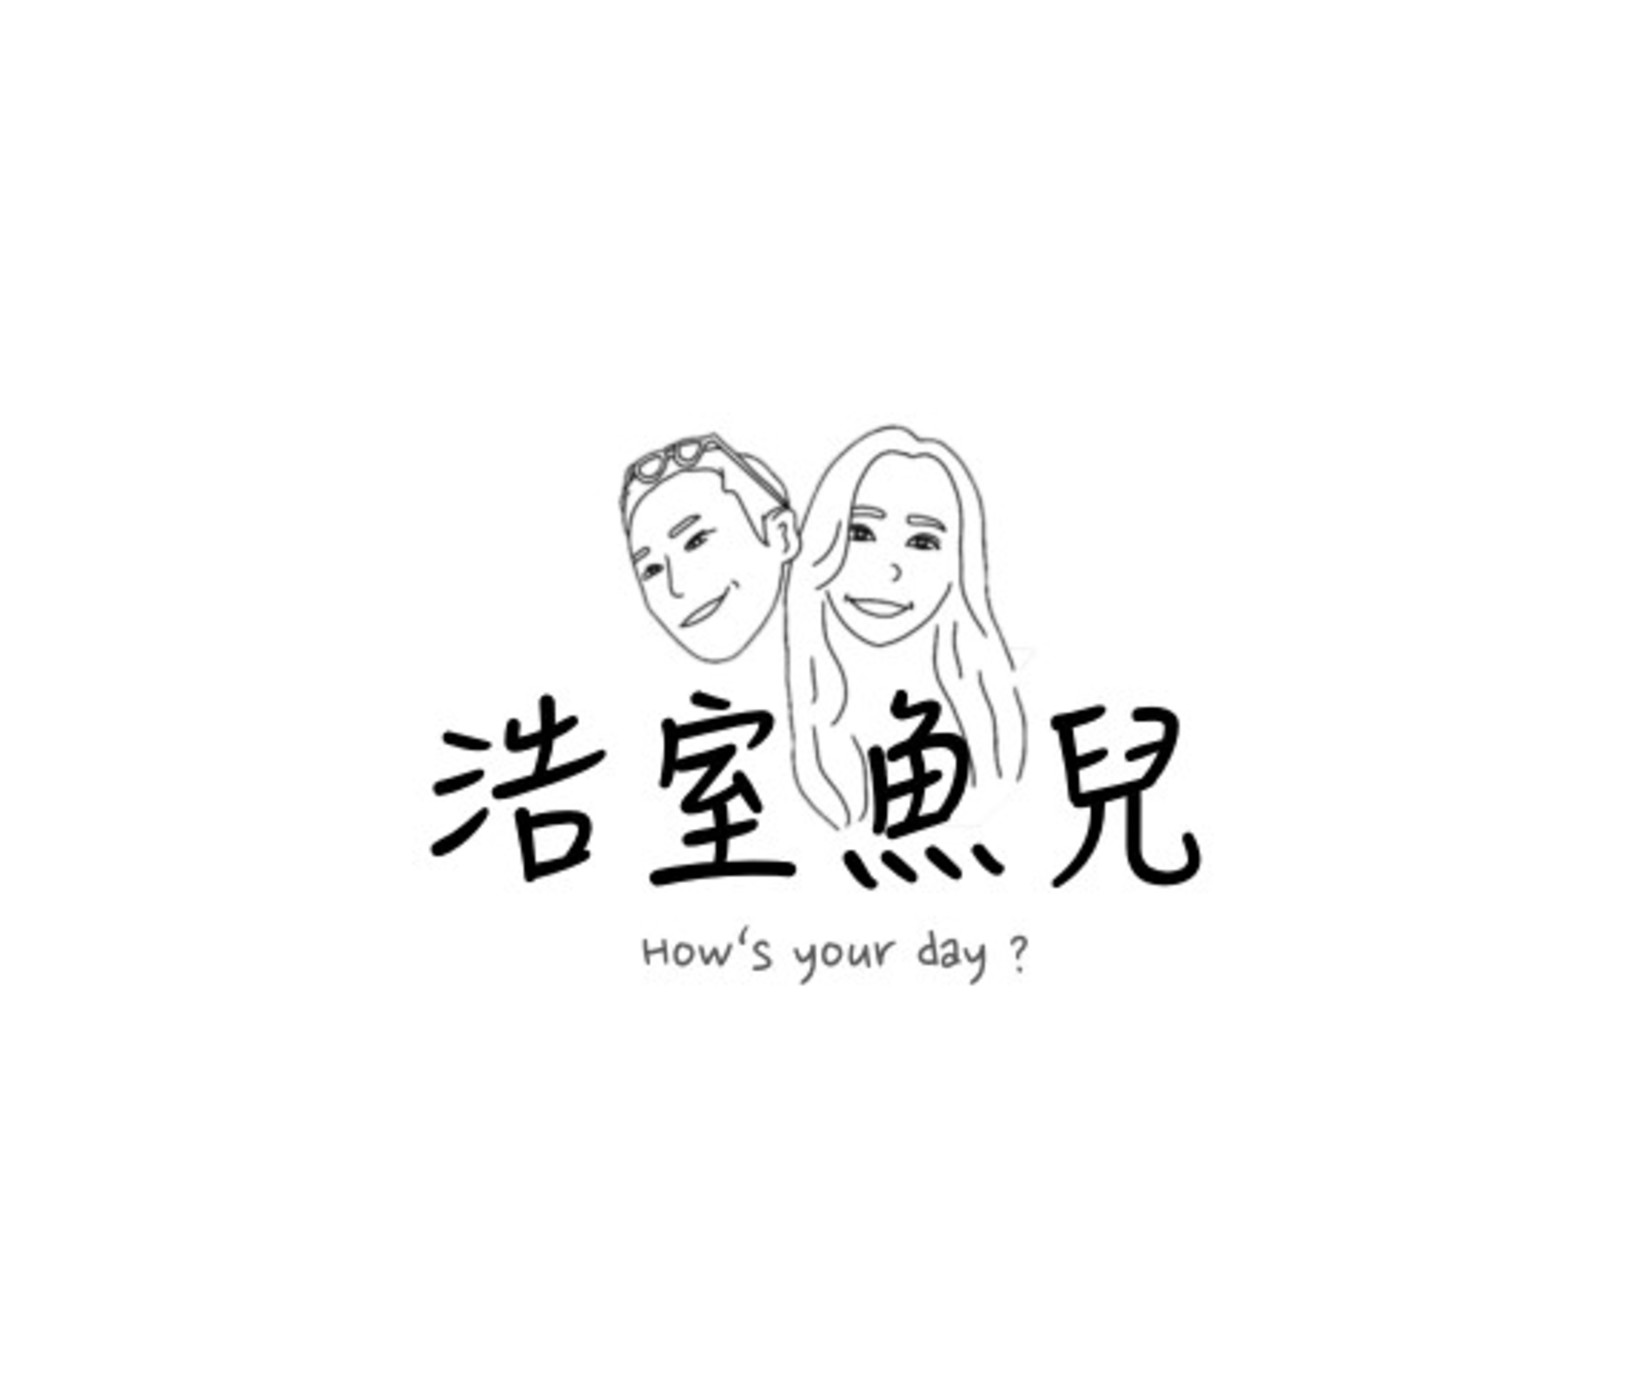 EP1浩室魚兒 為何要開Podcast(因為蓓蓓聲音很好聽?)